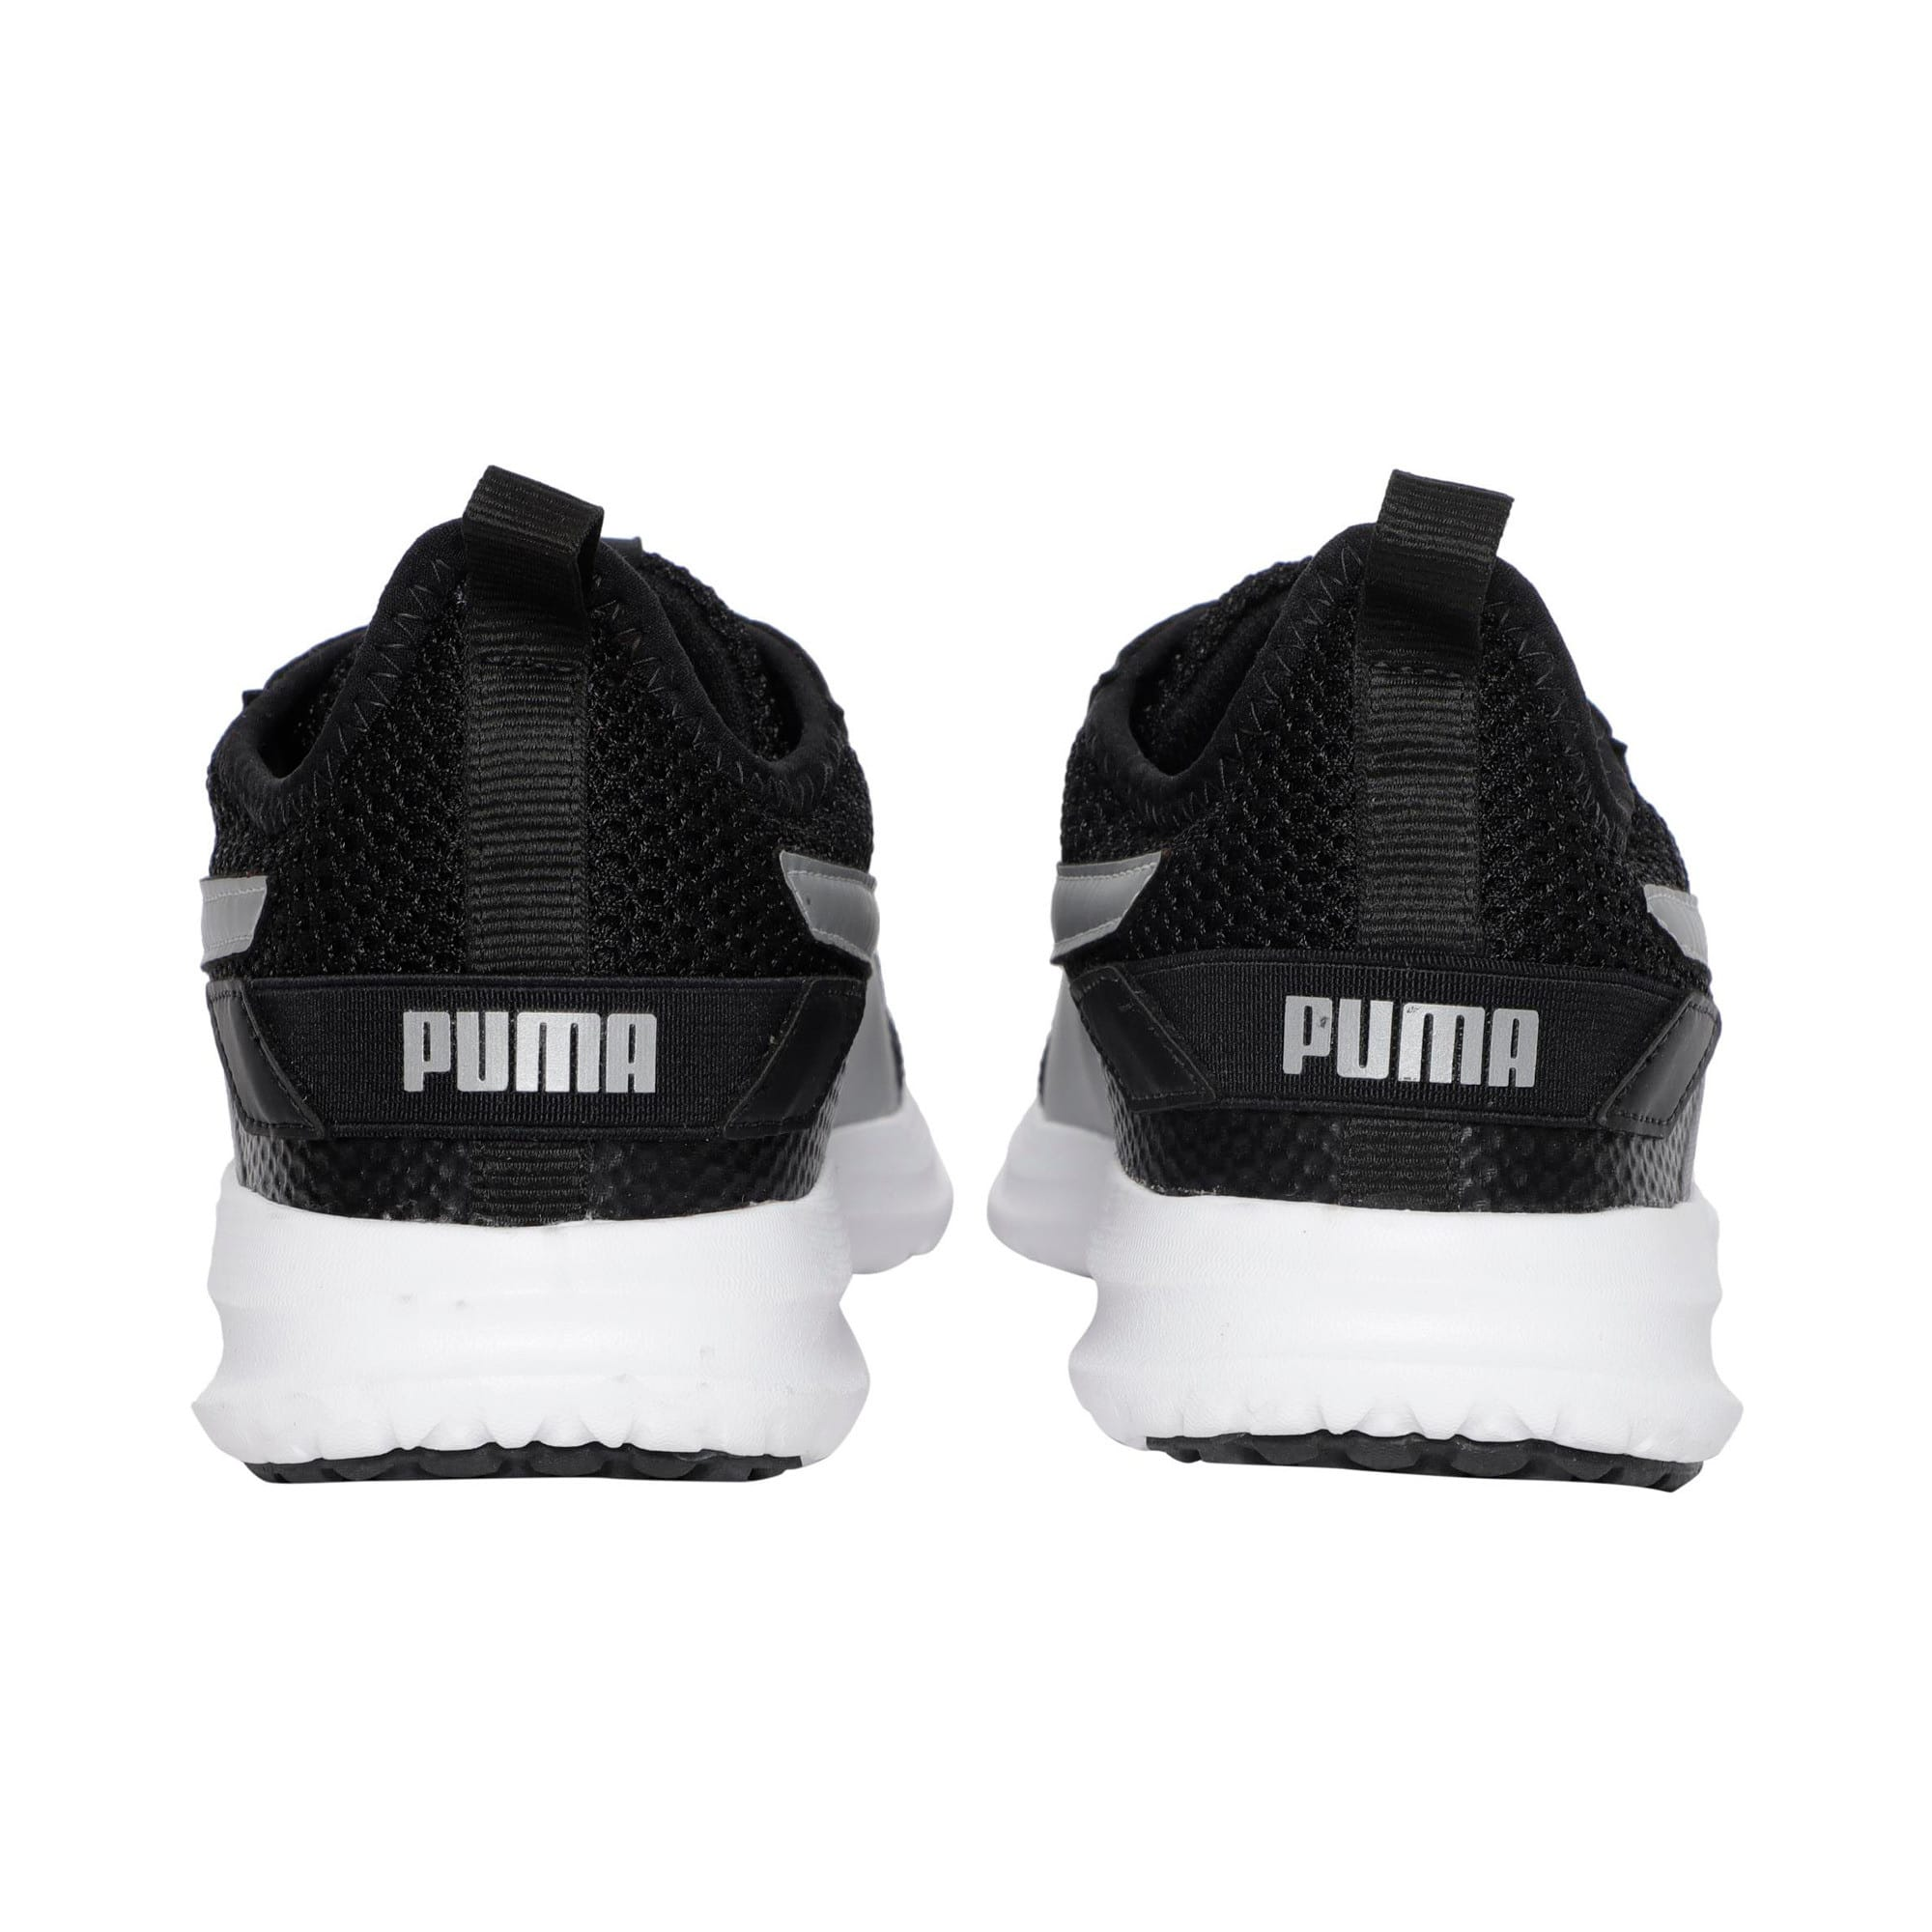 Thumbnail 3 of Flex T2 IDP Puma Black-Puma Silver, Puma Black-Puma Silver, medium-IND